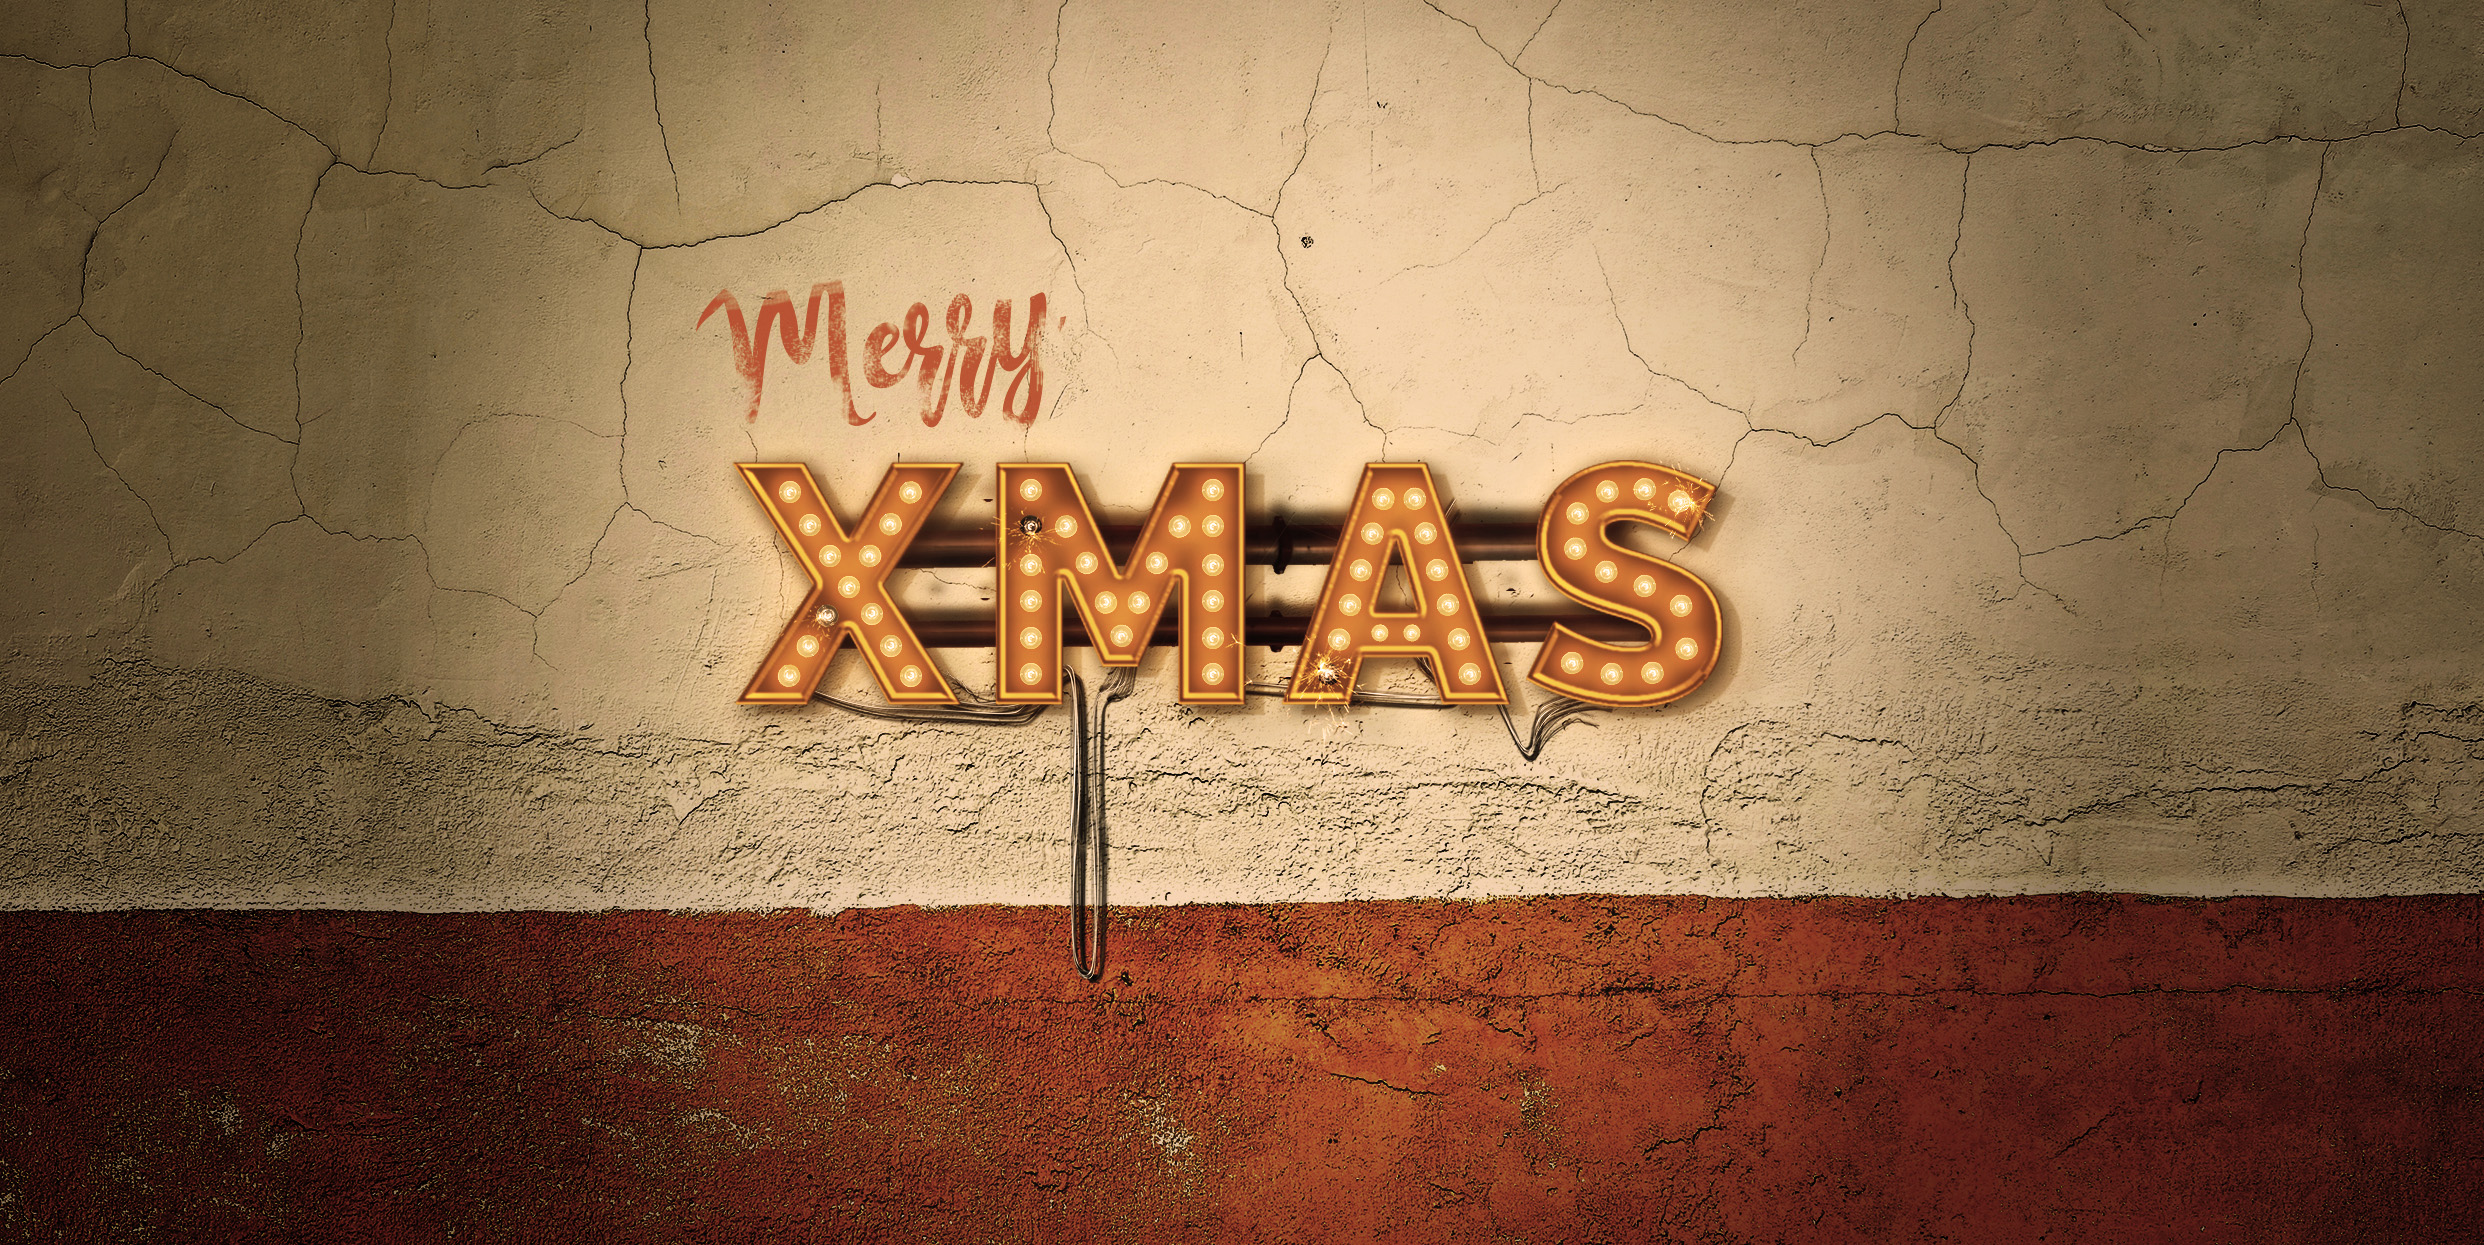 Lightbulb Merry Christmas Signs | 14-Image Bundle example image 7